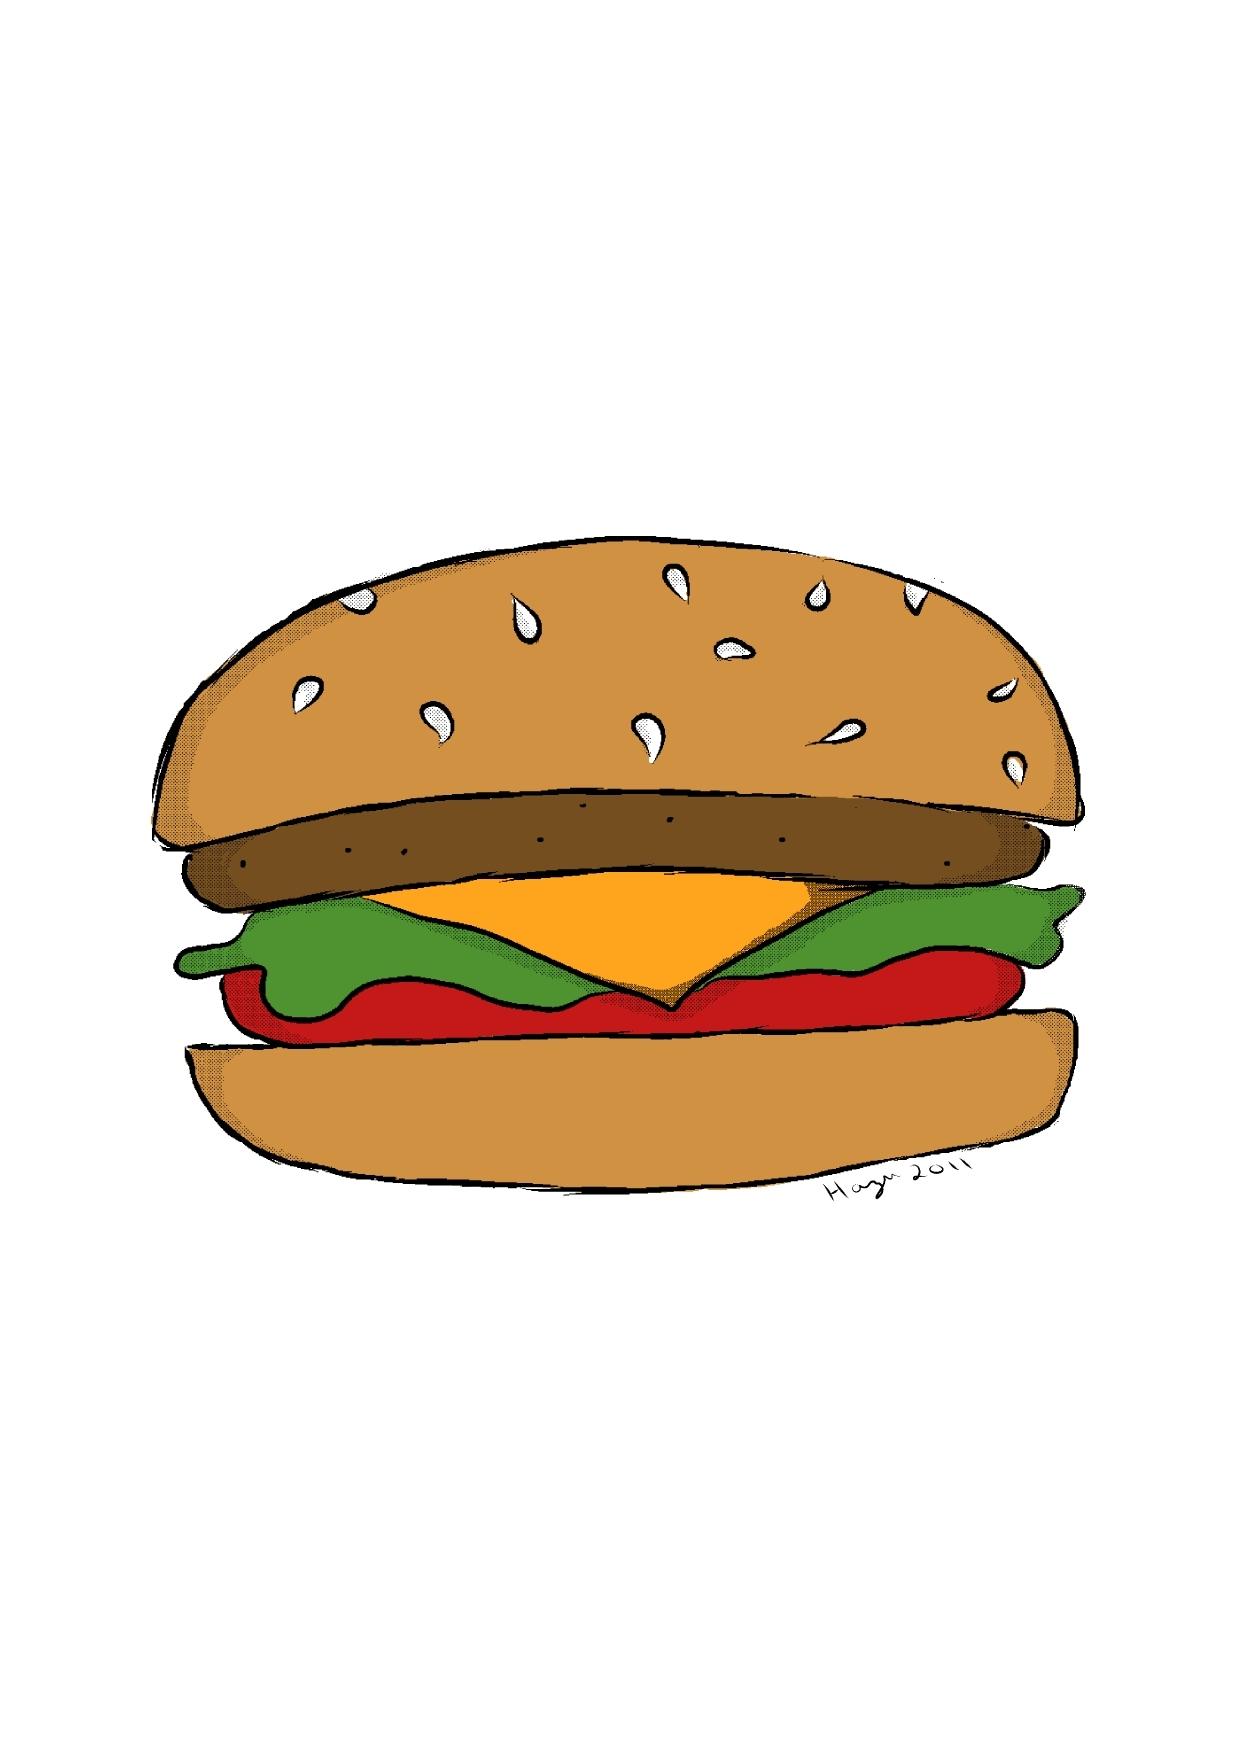 Burger clipart colored. Cheeseburger by hazuhazuheavn on